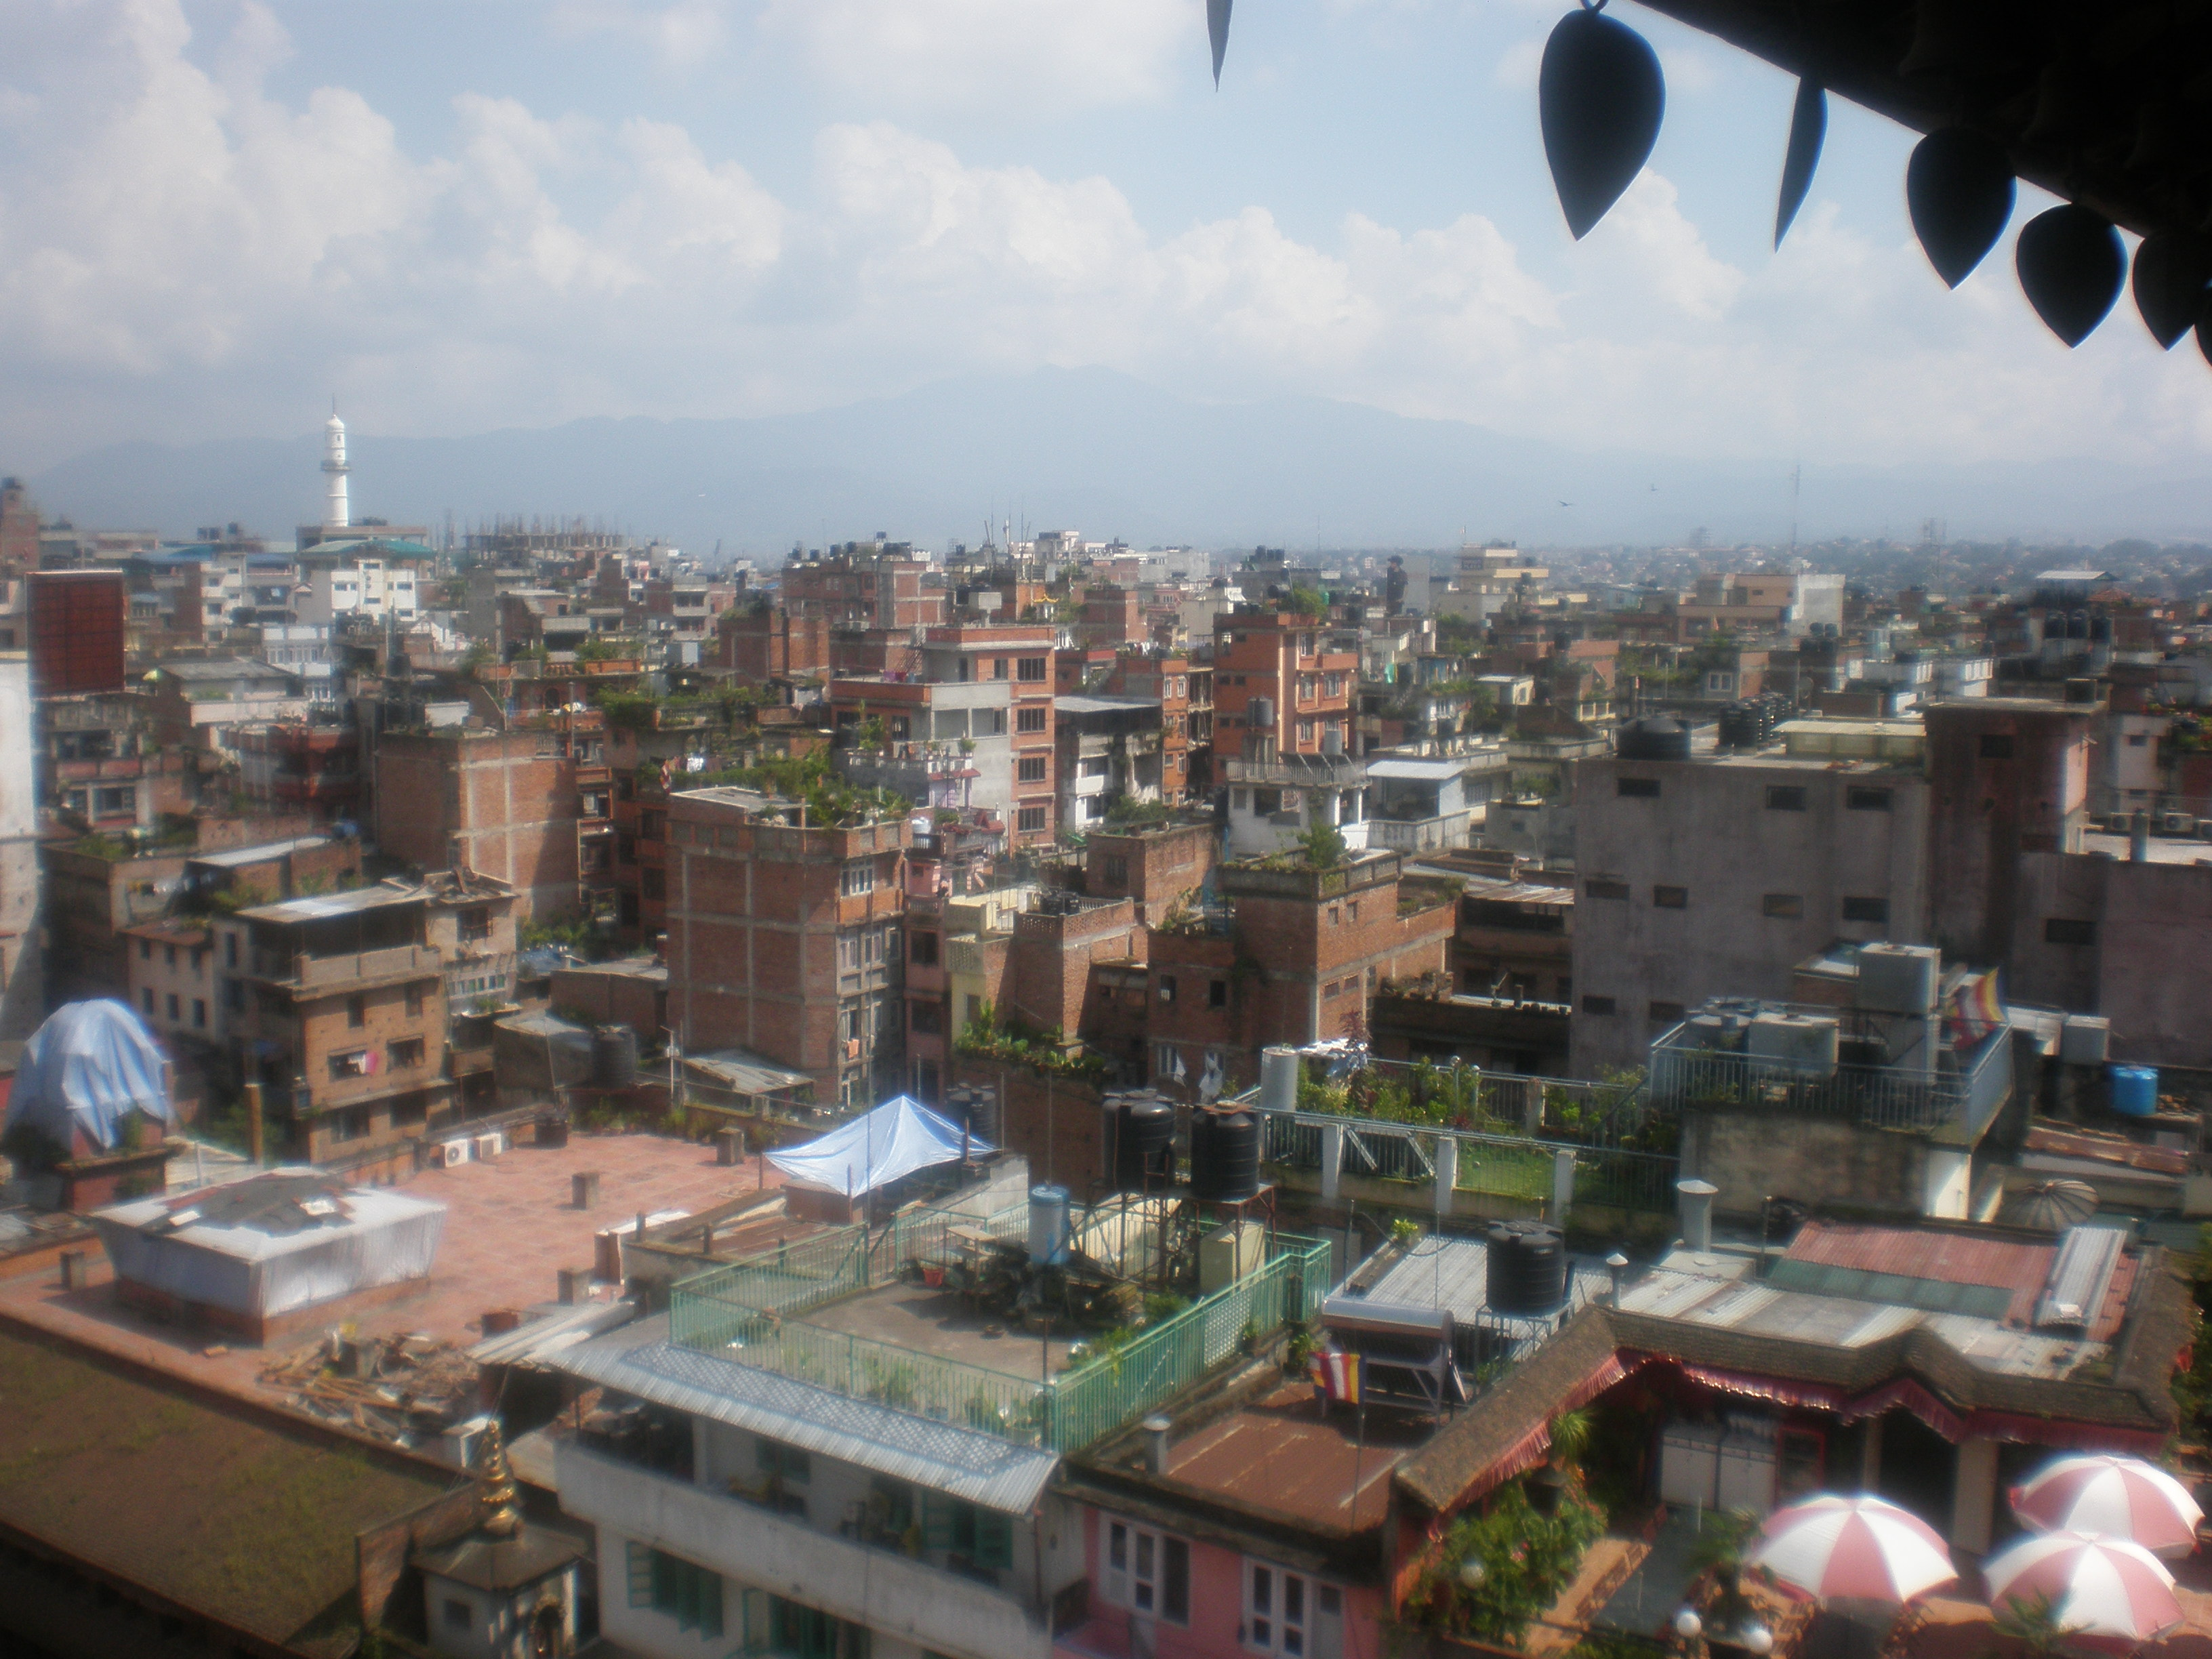 free online dating nepal city kathmandu